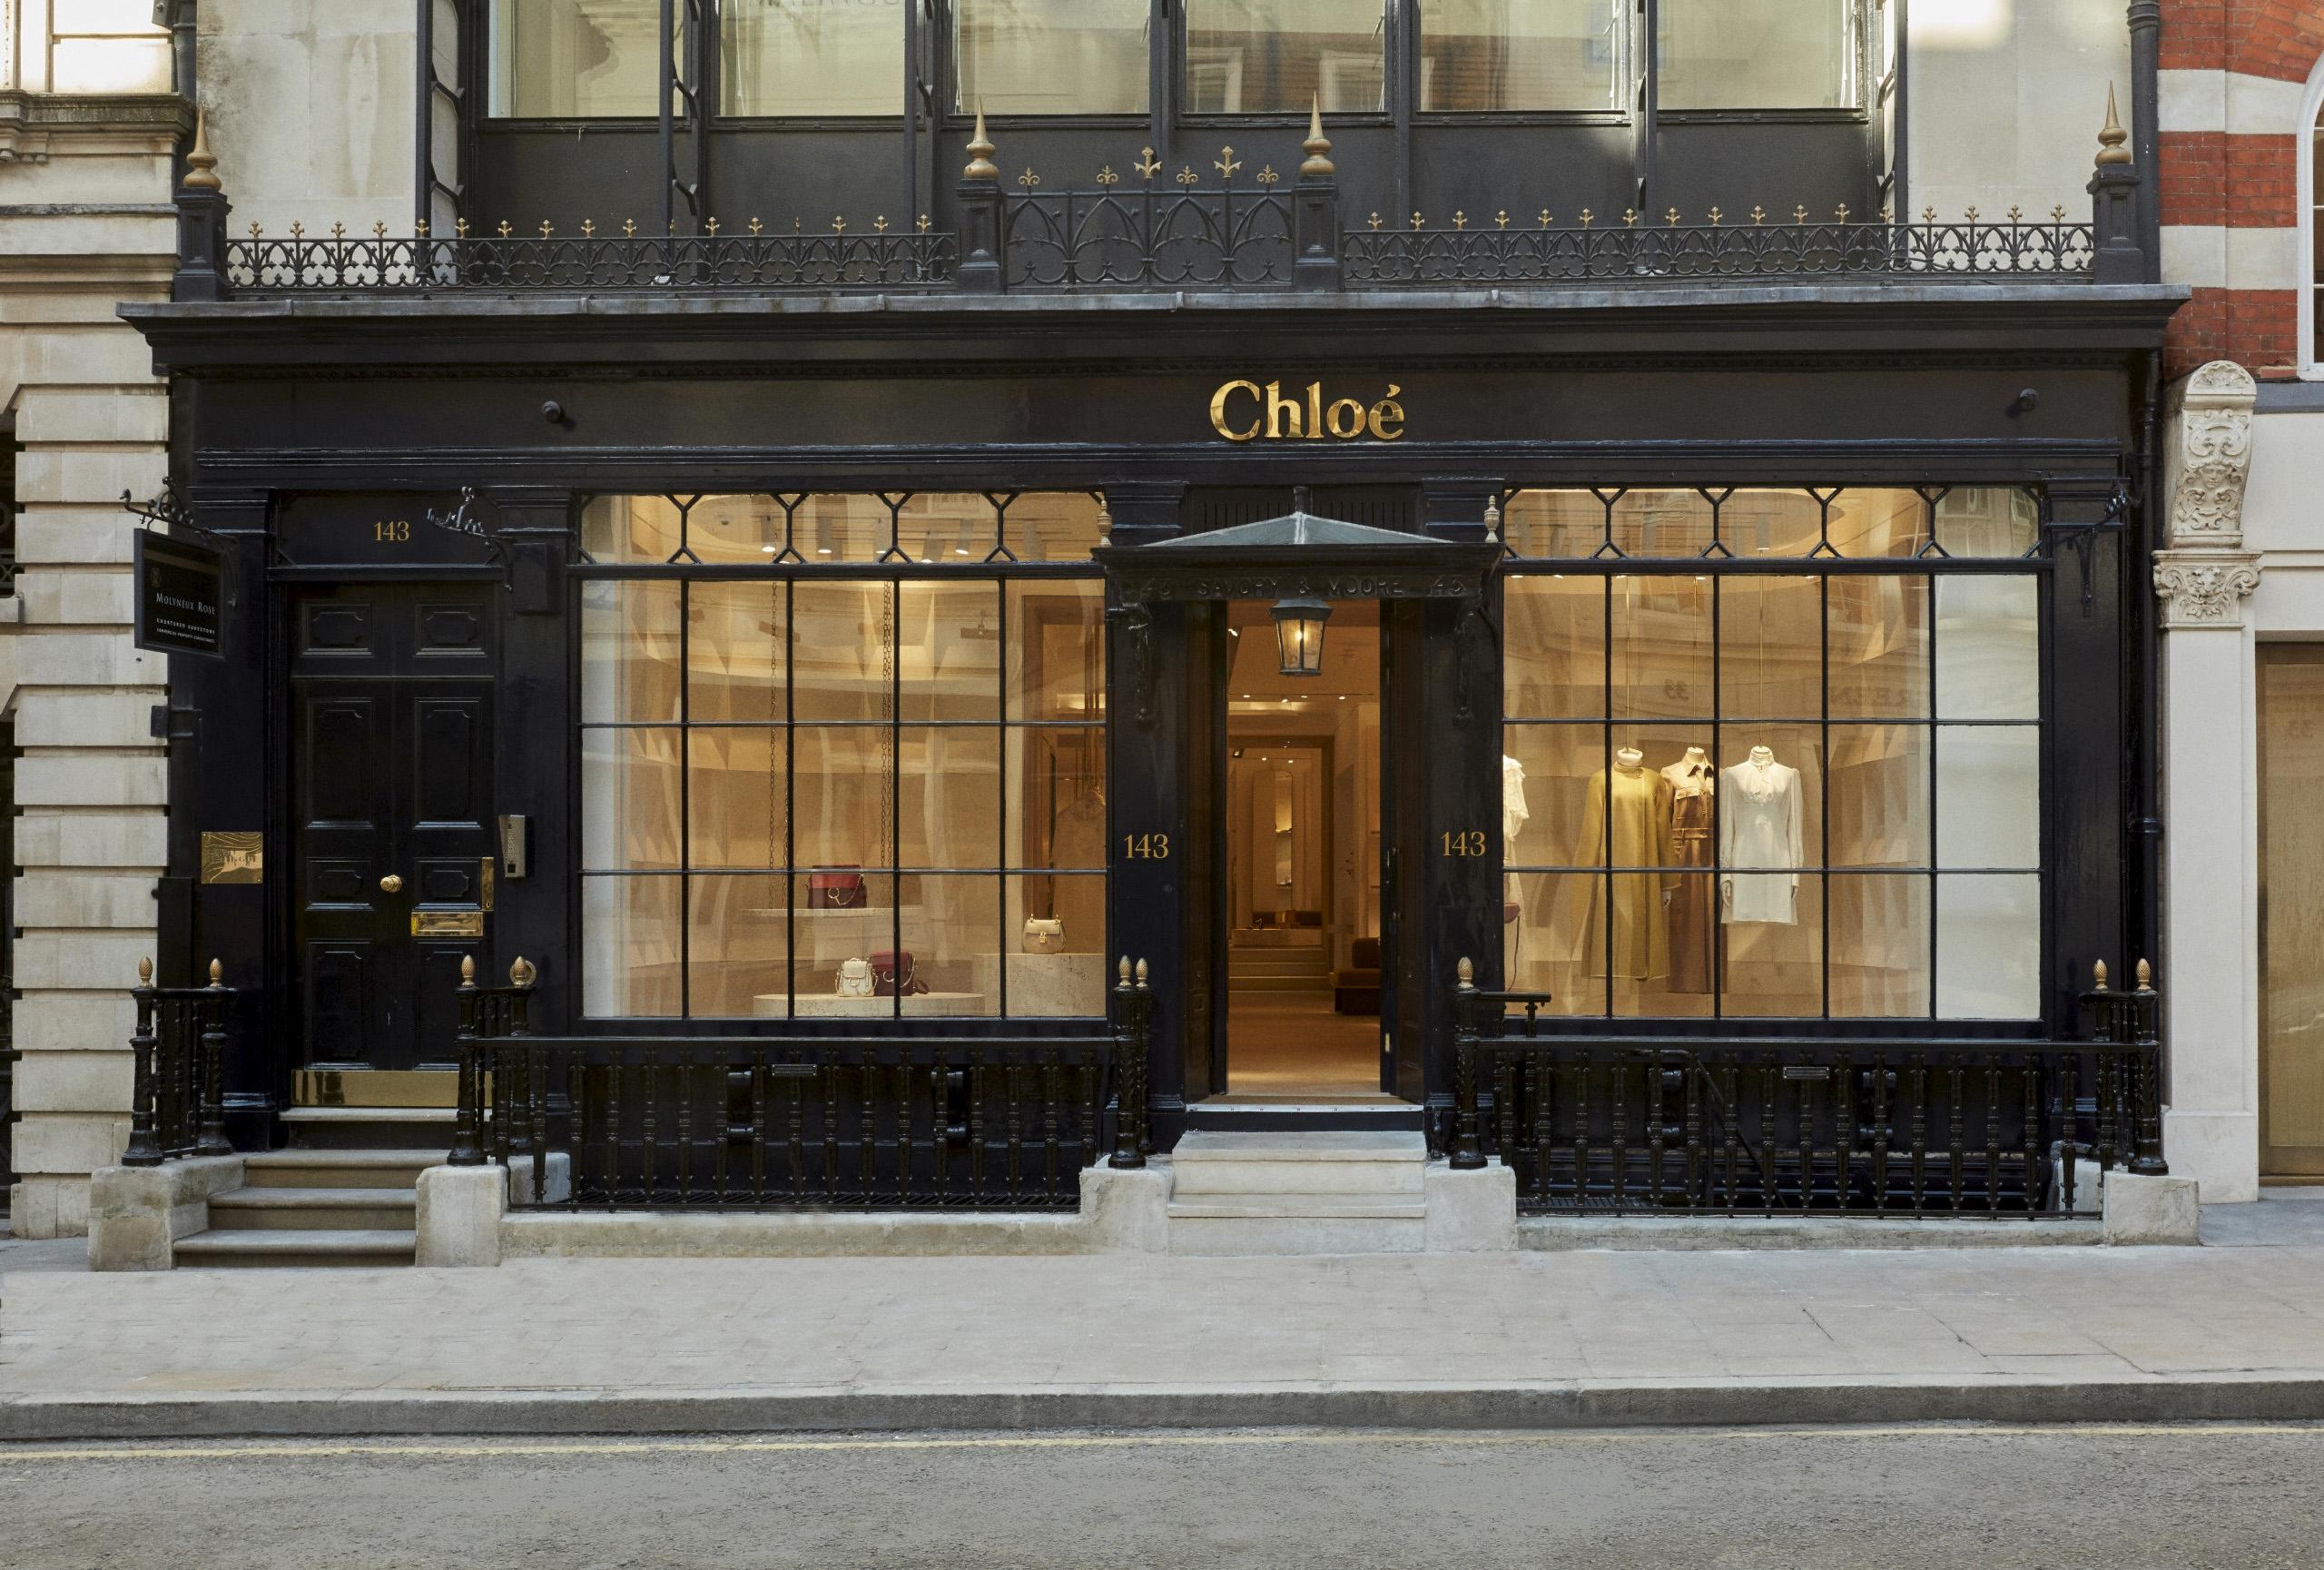 Chloé's new London store New Bond Street